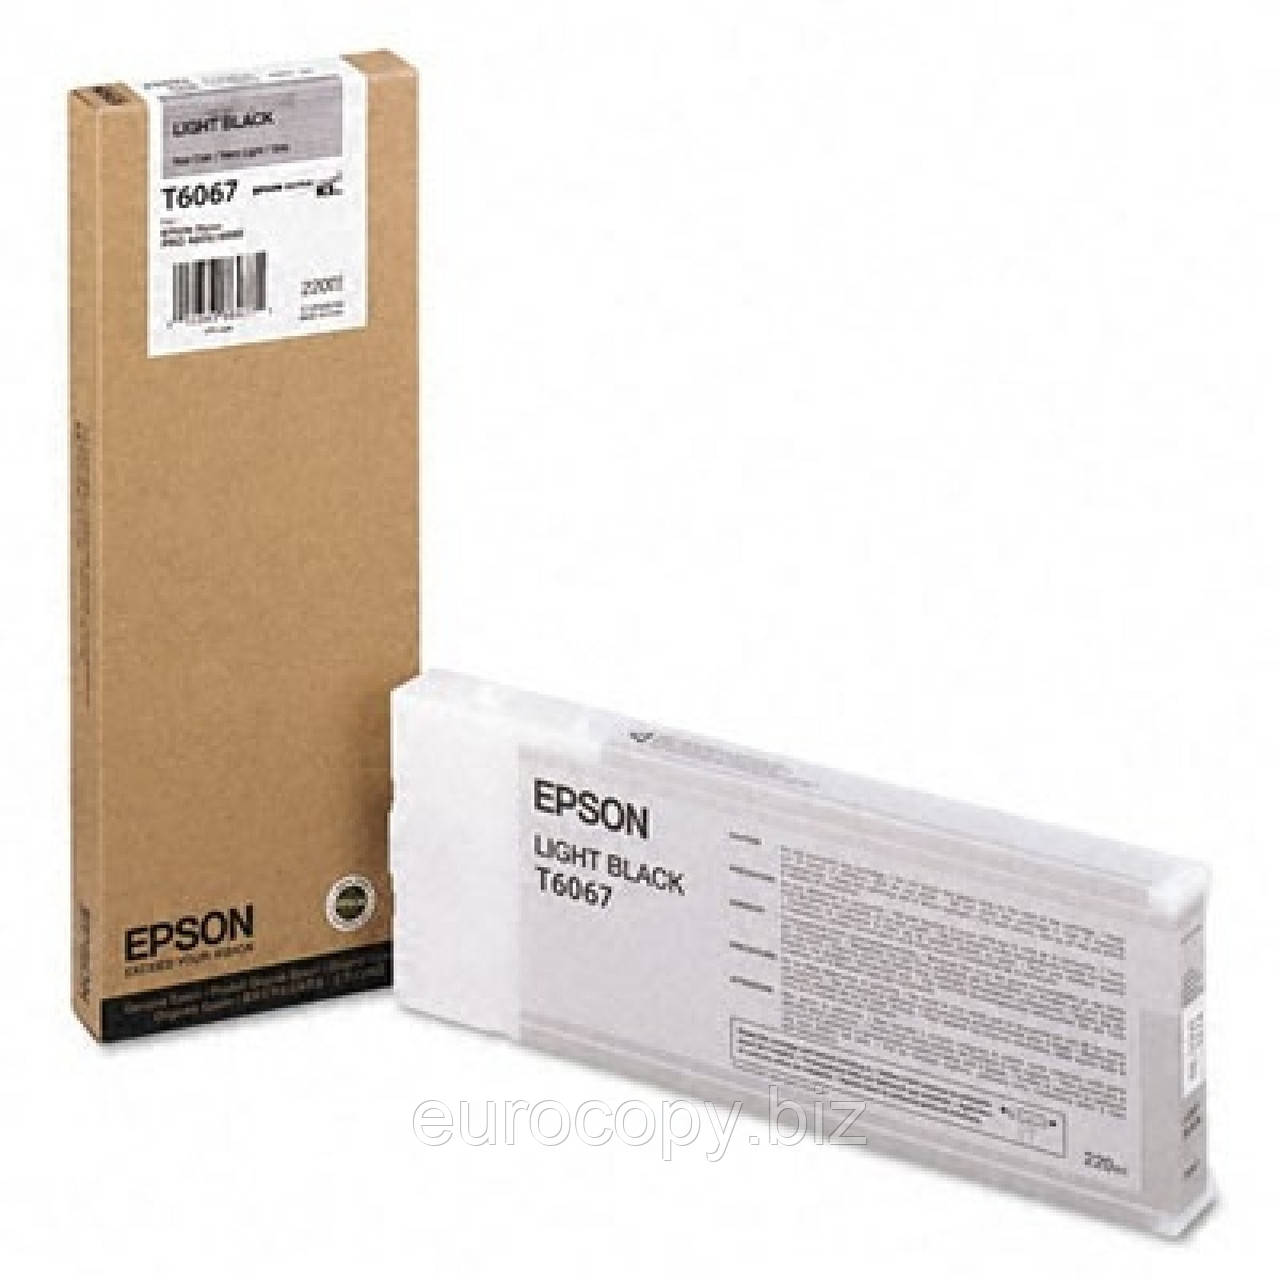 Картридж Epson StPro 4800 / 4880 light black 220мл (C13T606700)